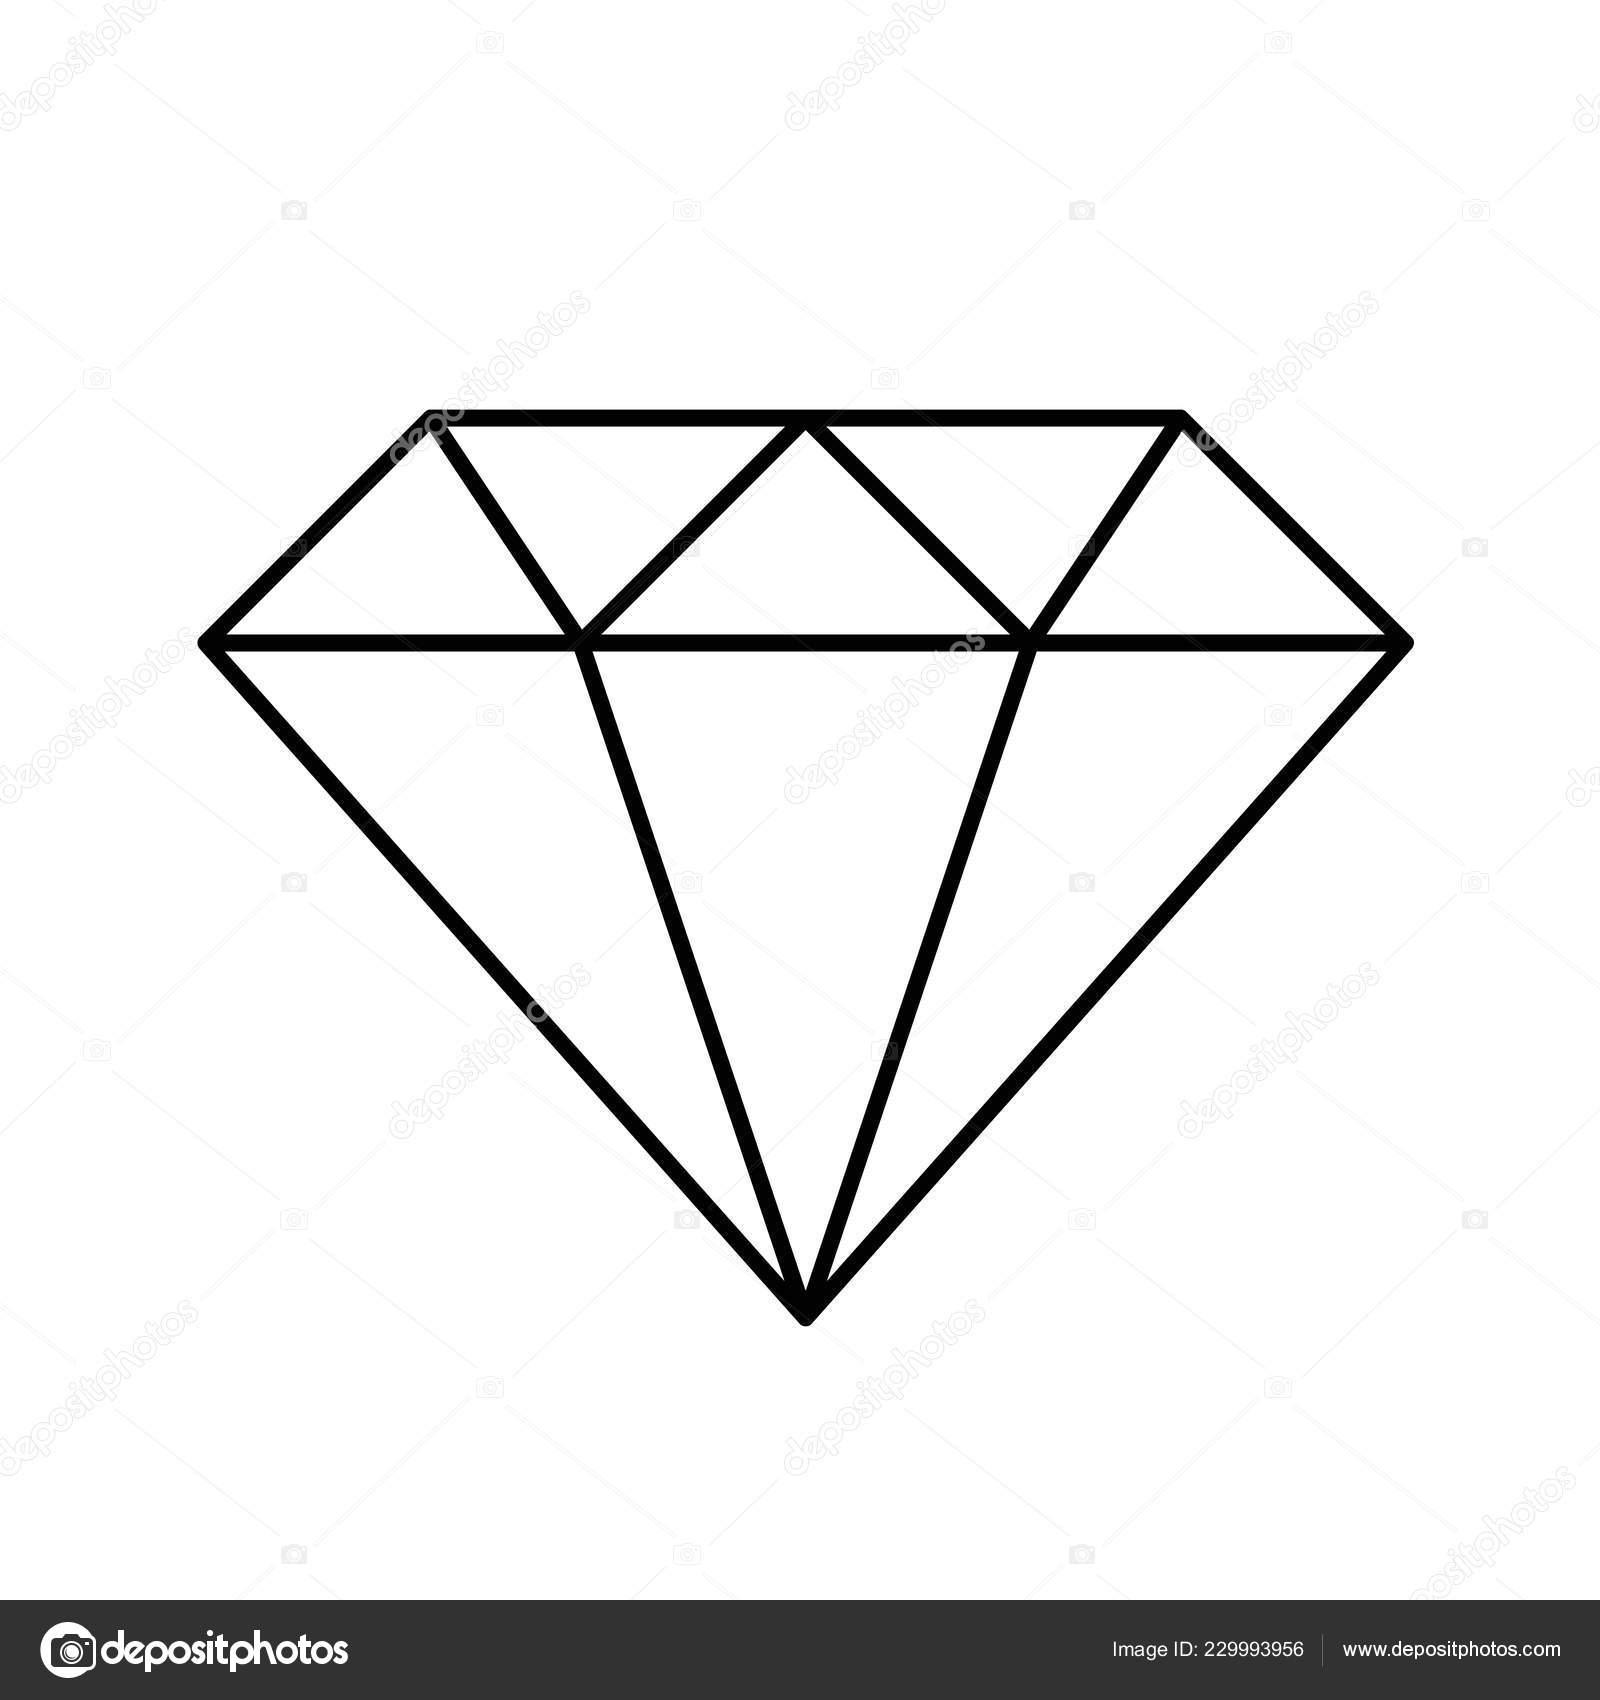 Diamond Simple Icon Pictogram Outline